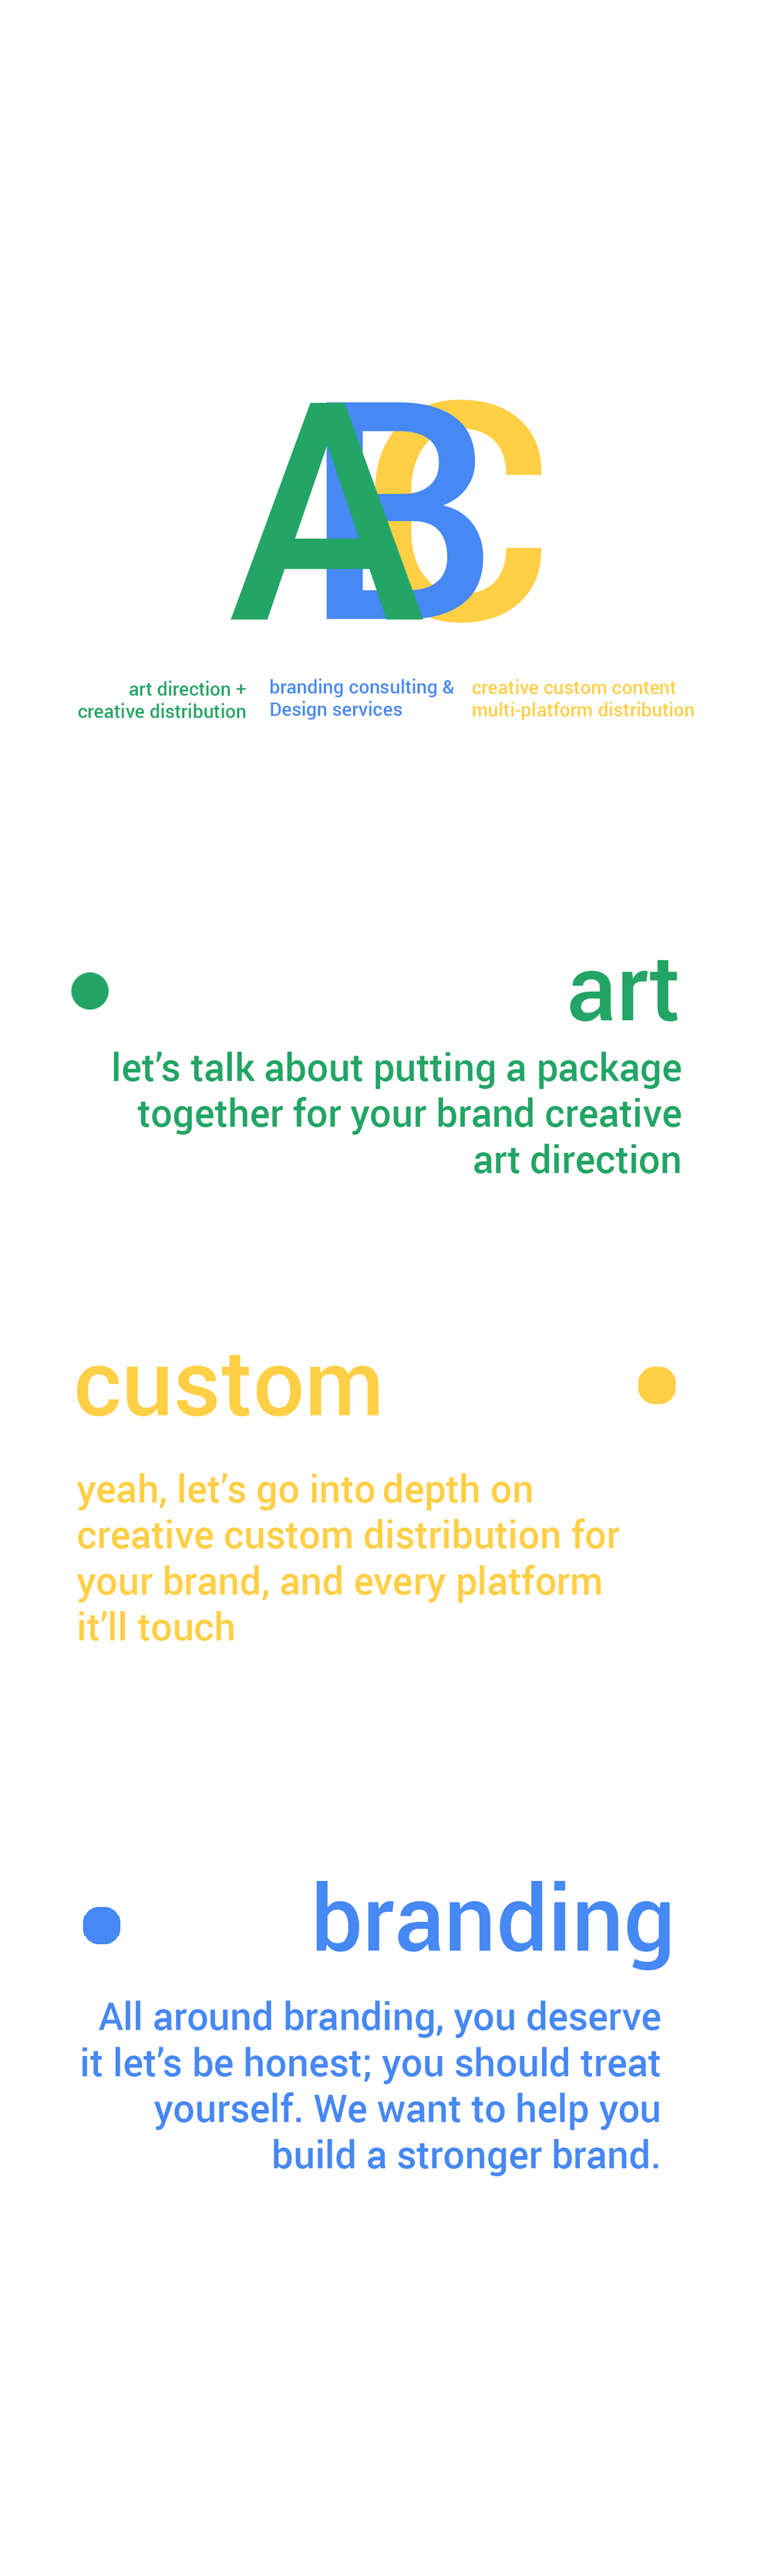 ABC | art direction, custom content, branding